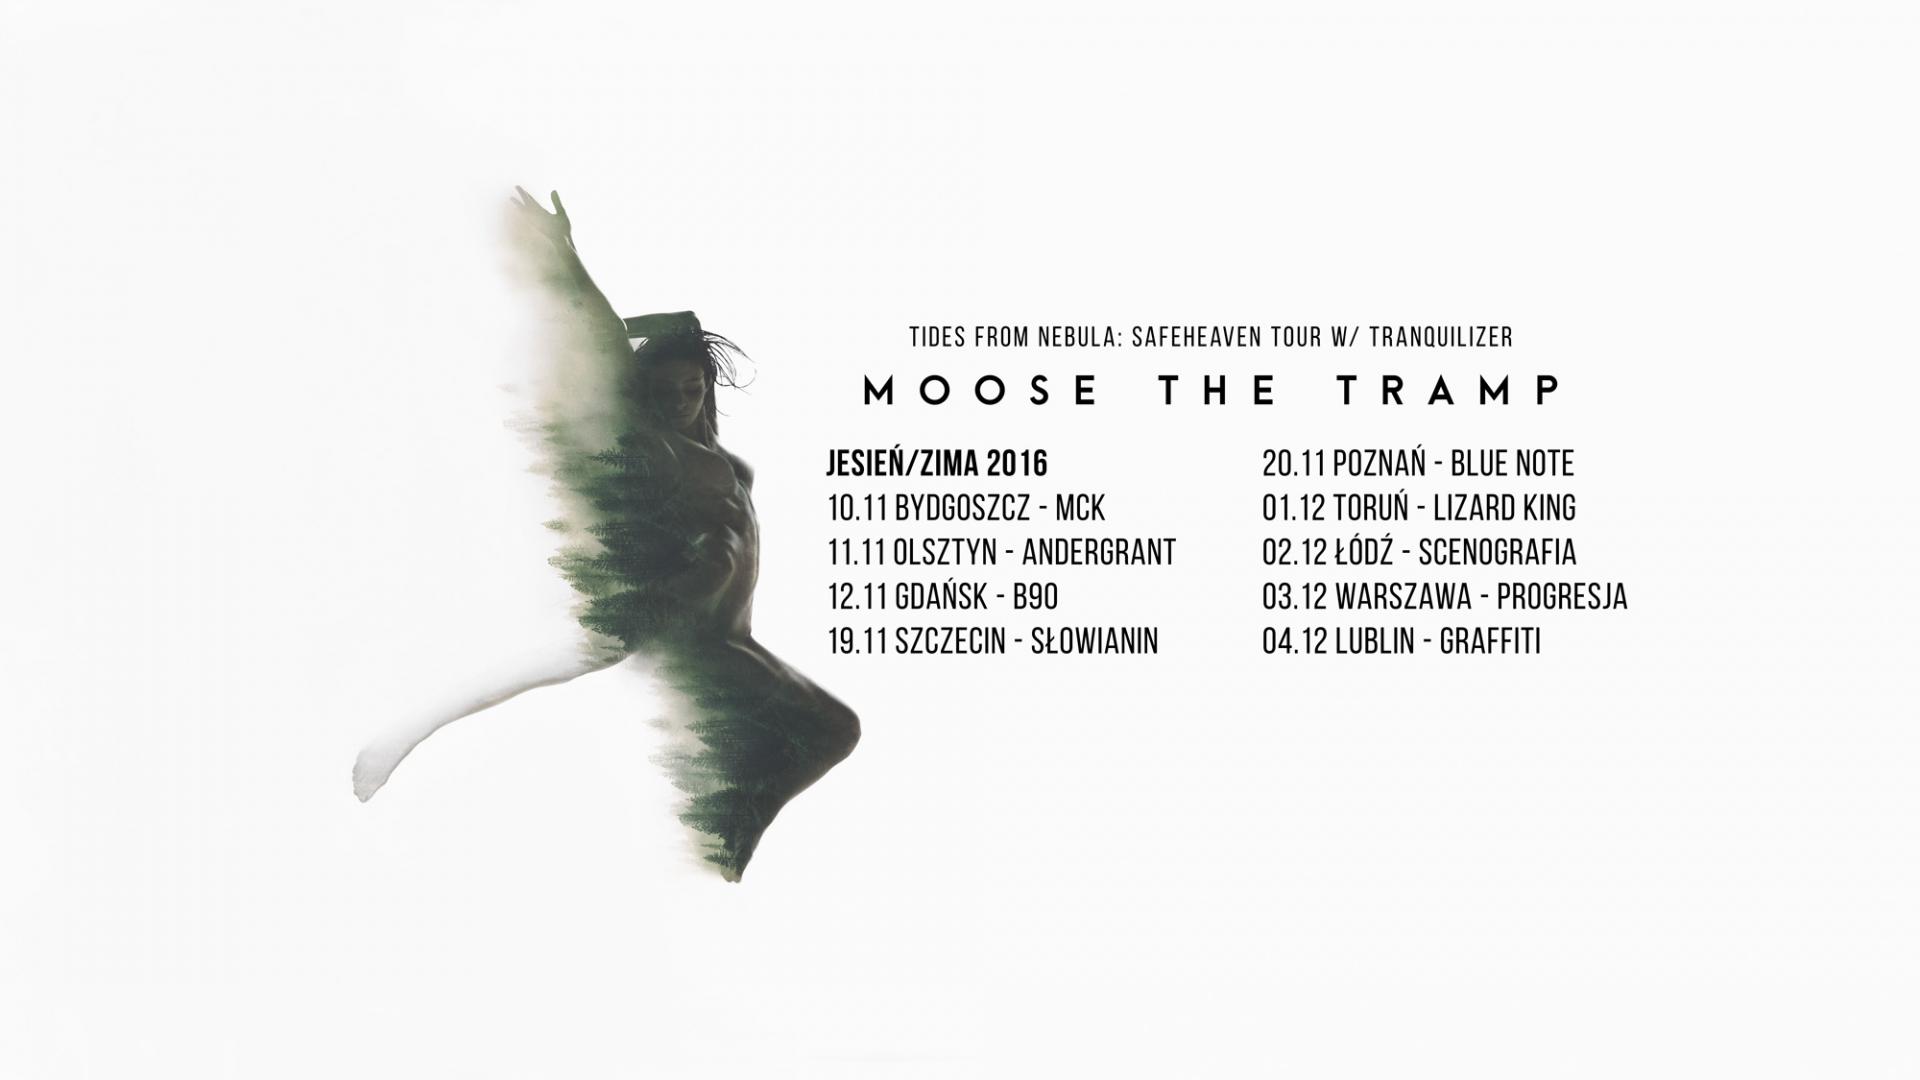 Moose The Tramp - Moose The Tramp